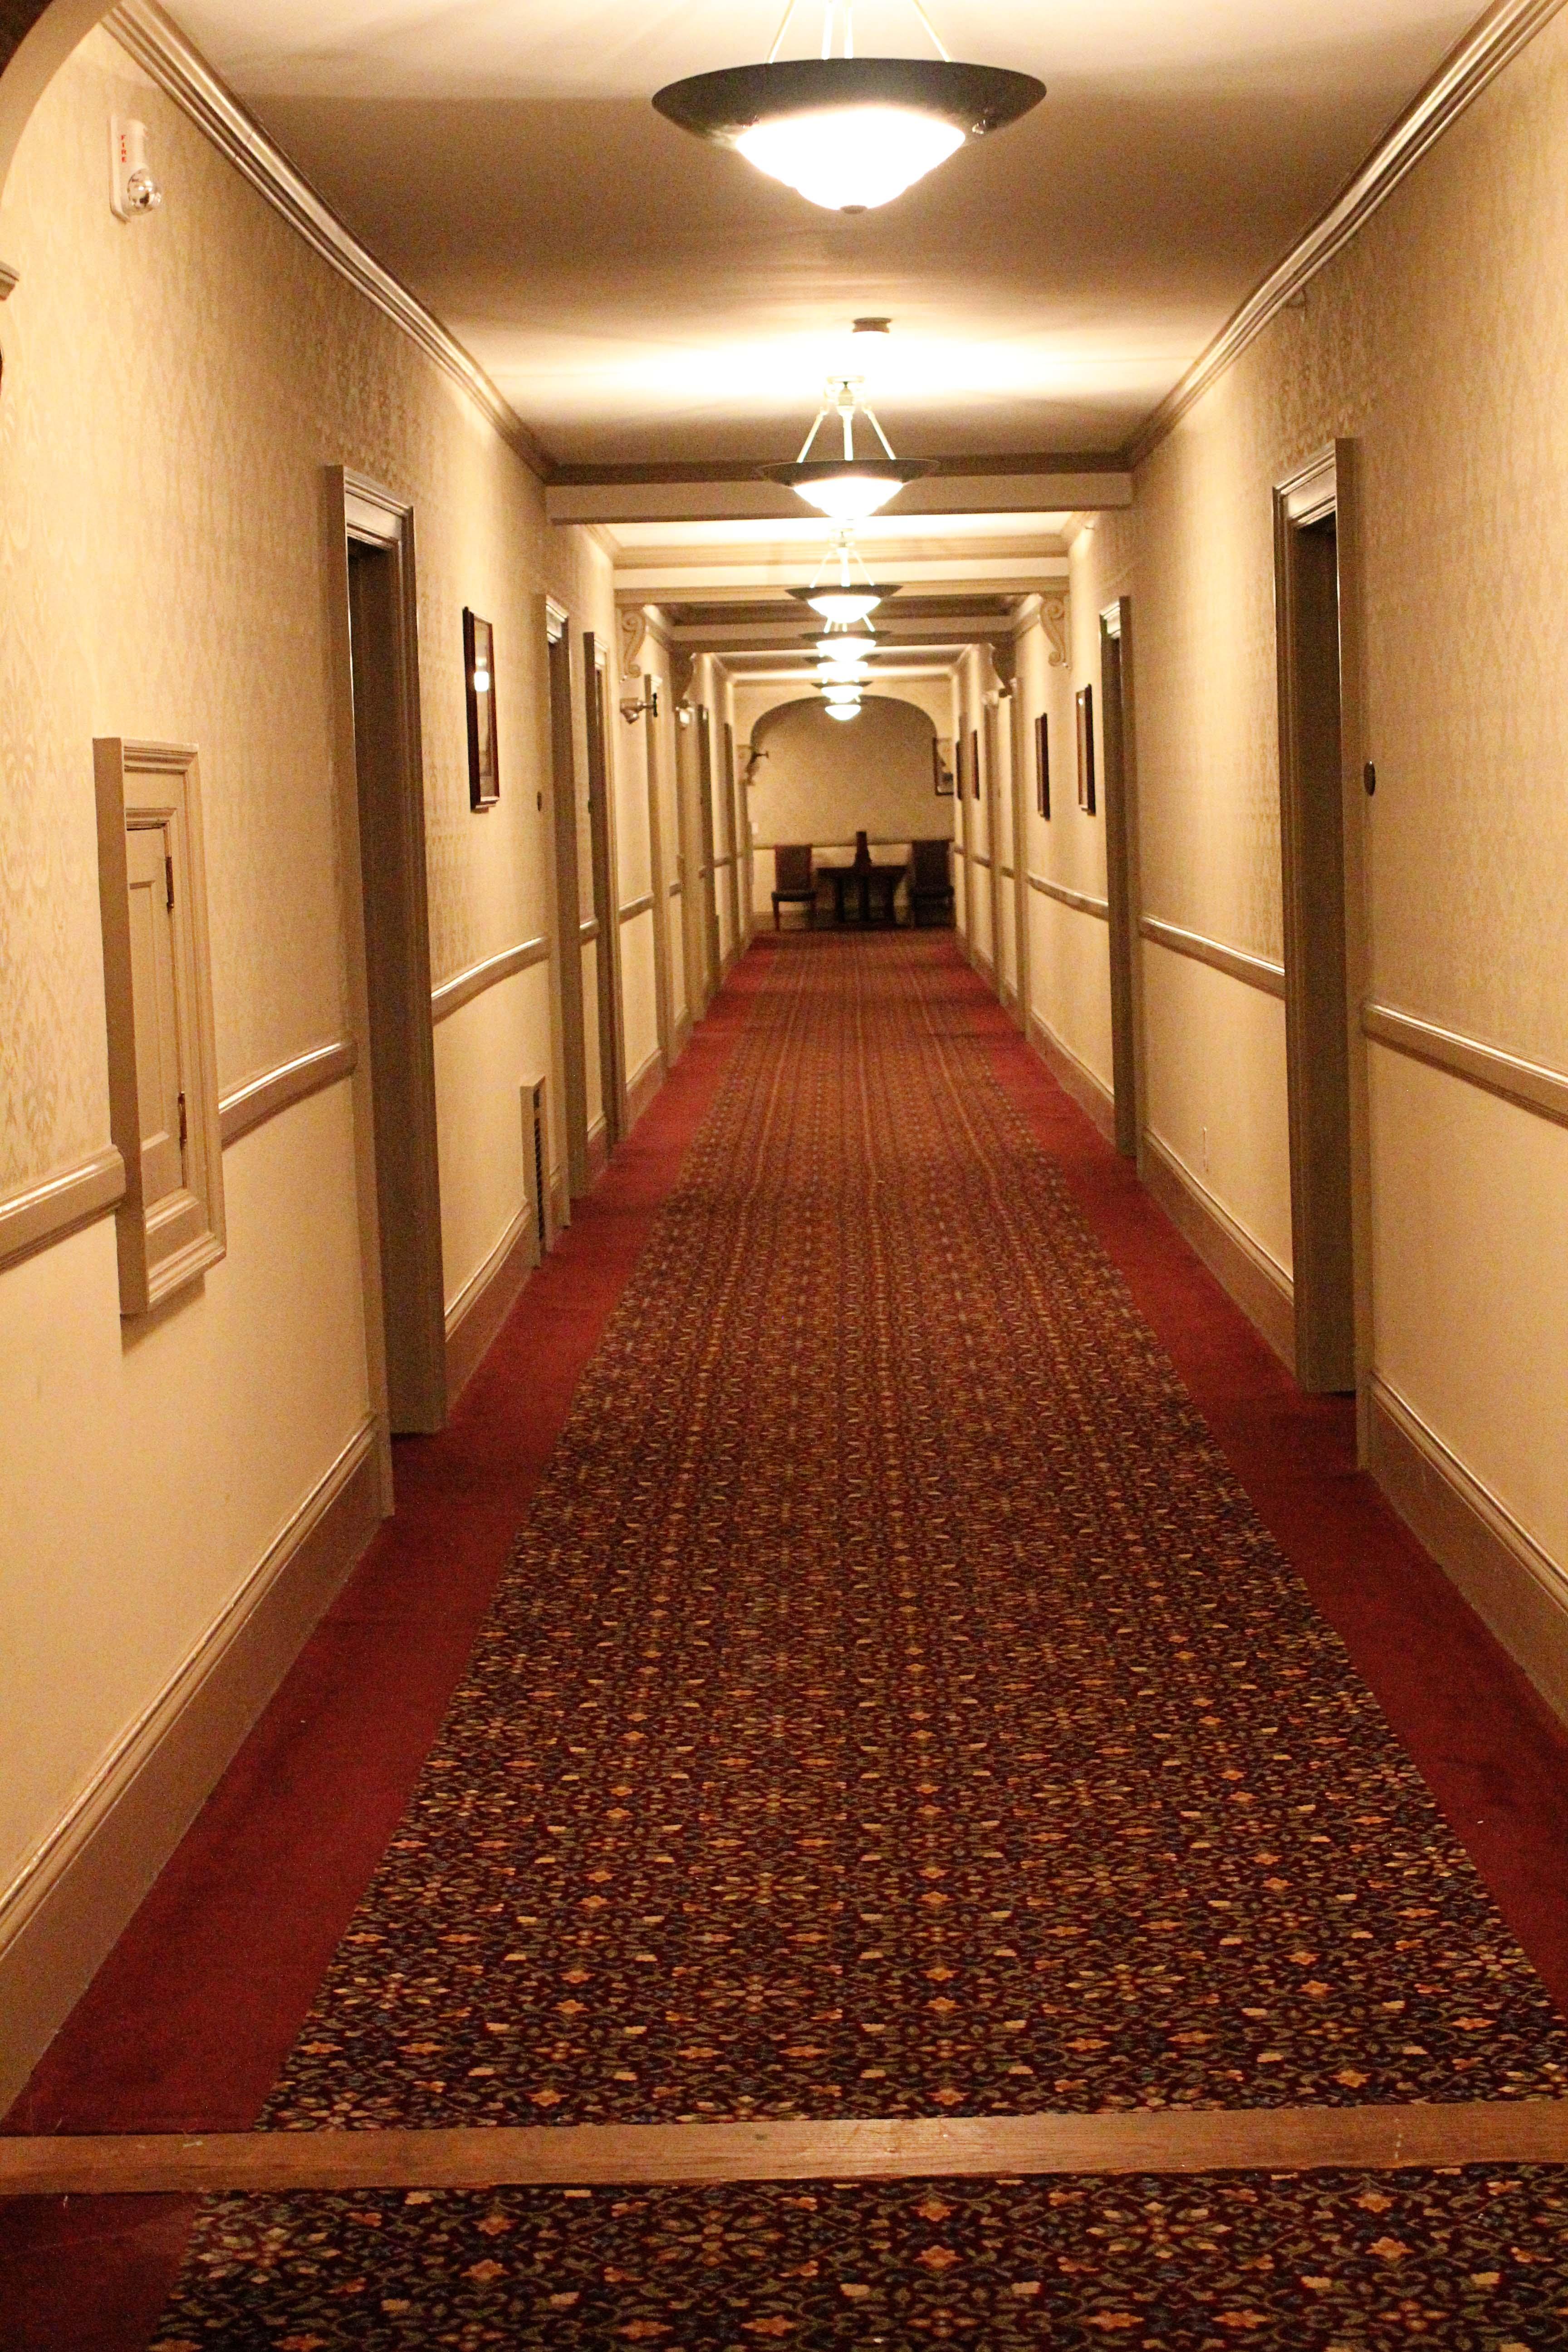 The shining hotel hallway images for Hallways images